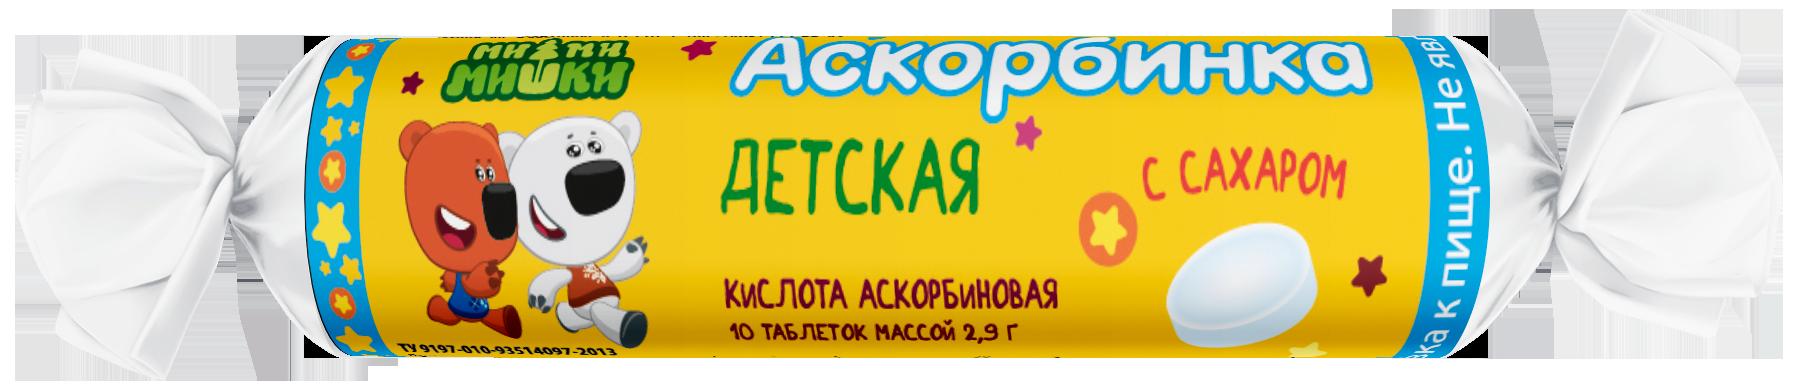 фото упаковки Ми-ми-мишки Аскорбинка детская с сахаром